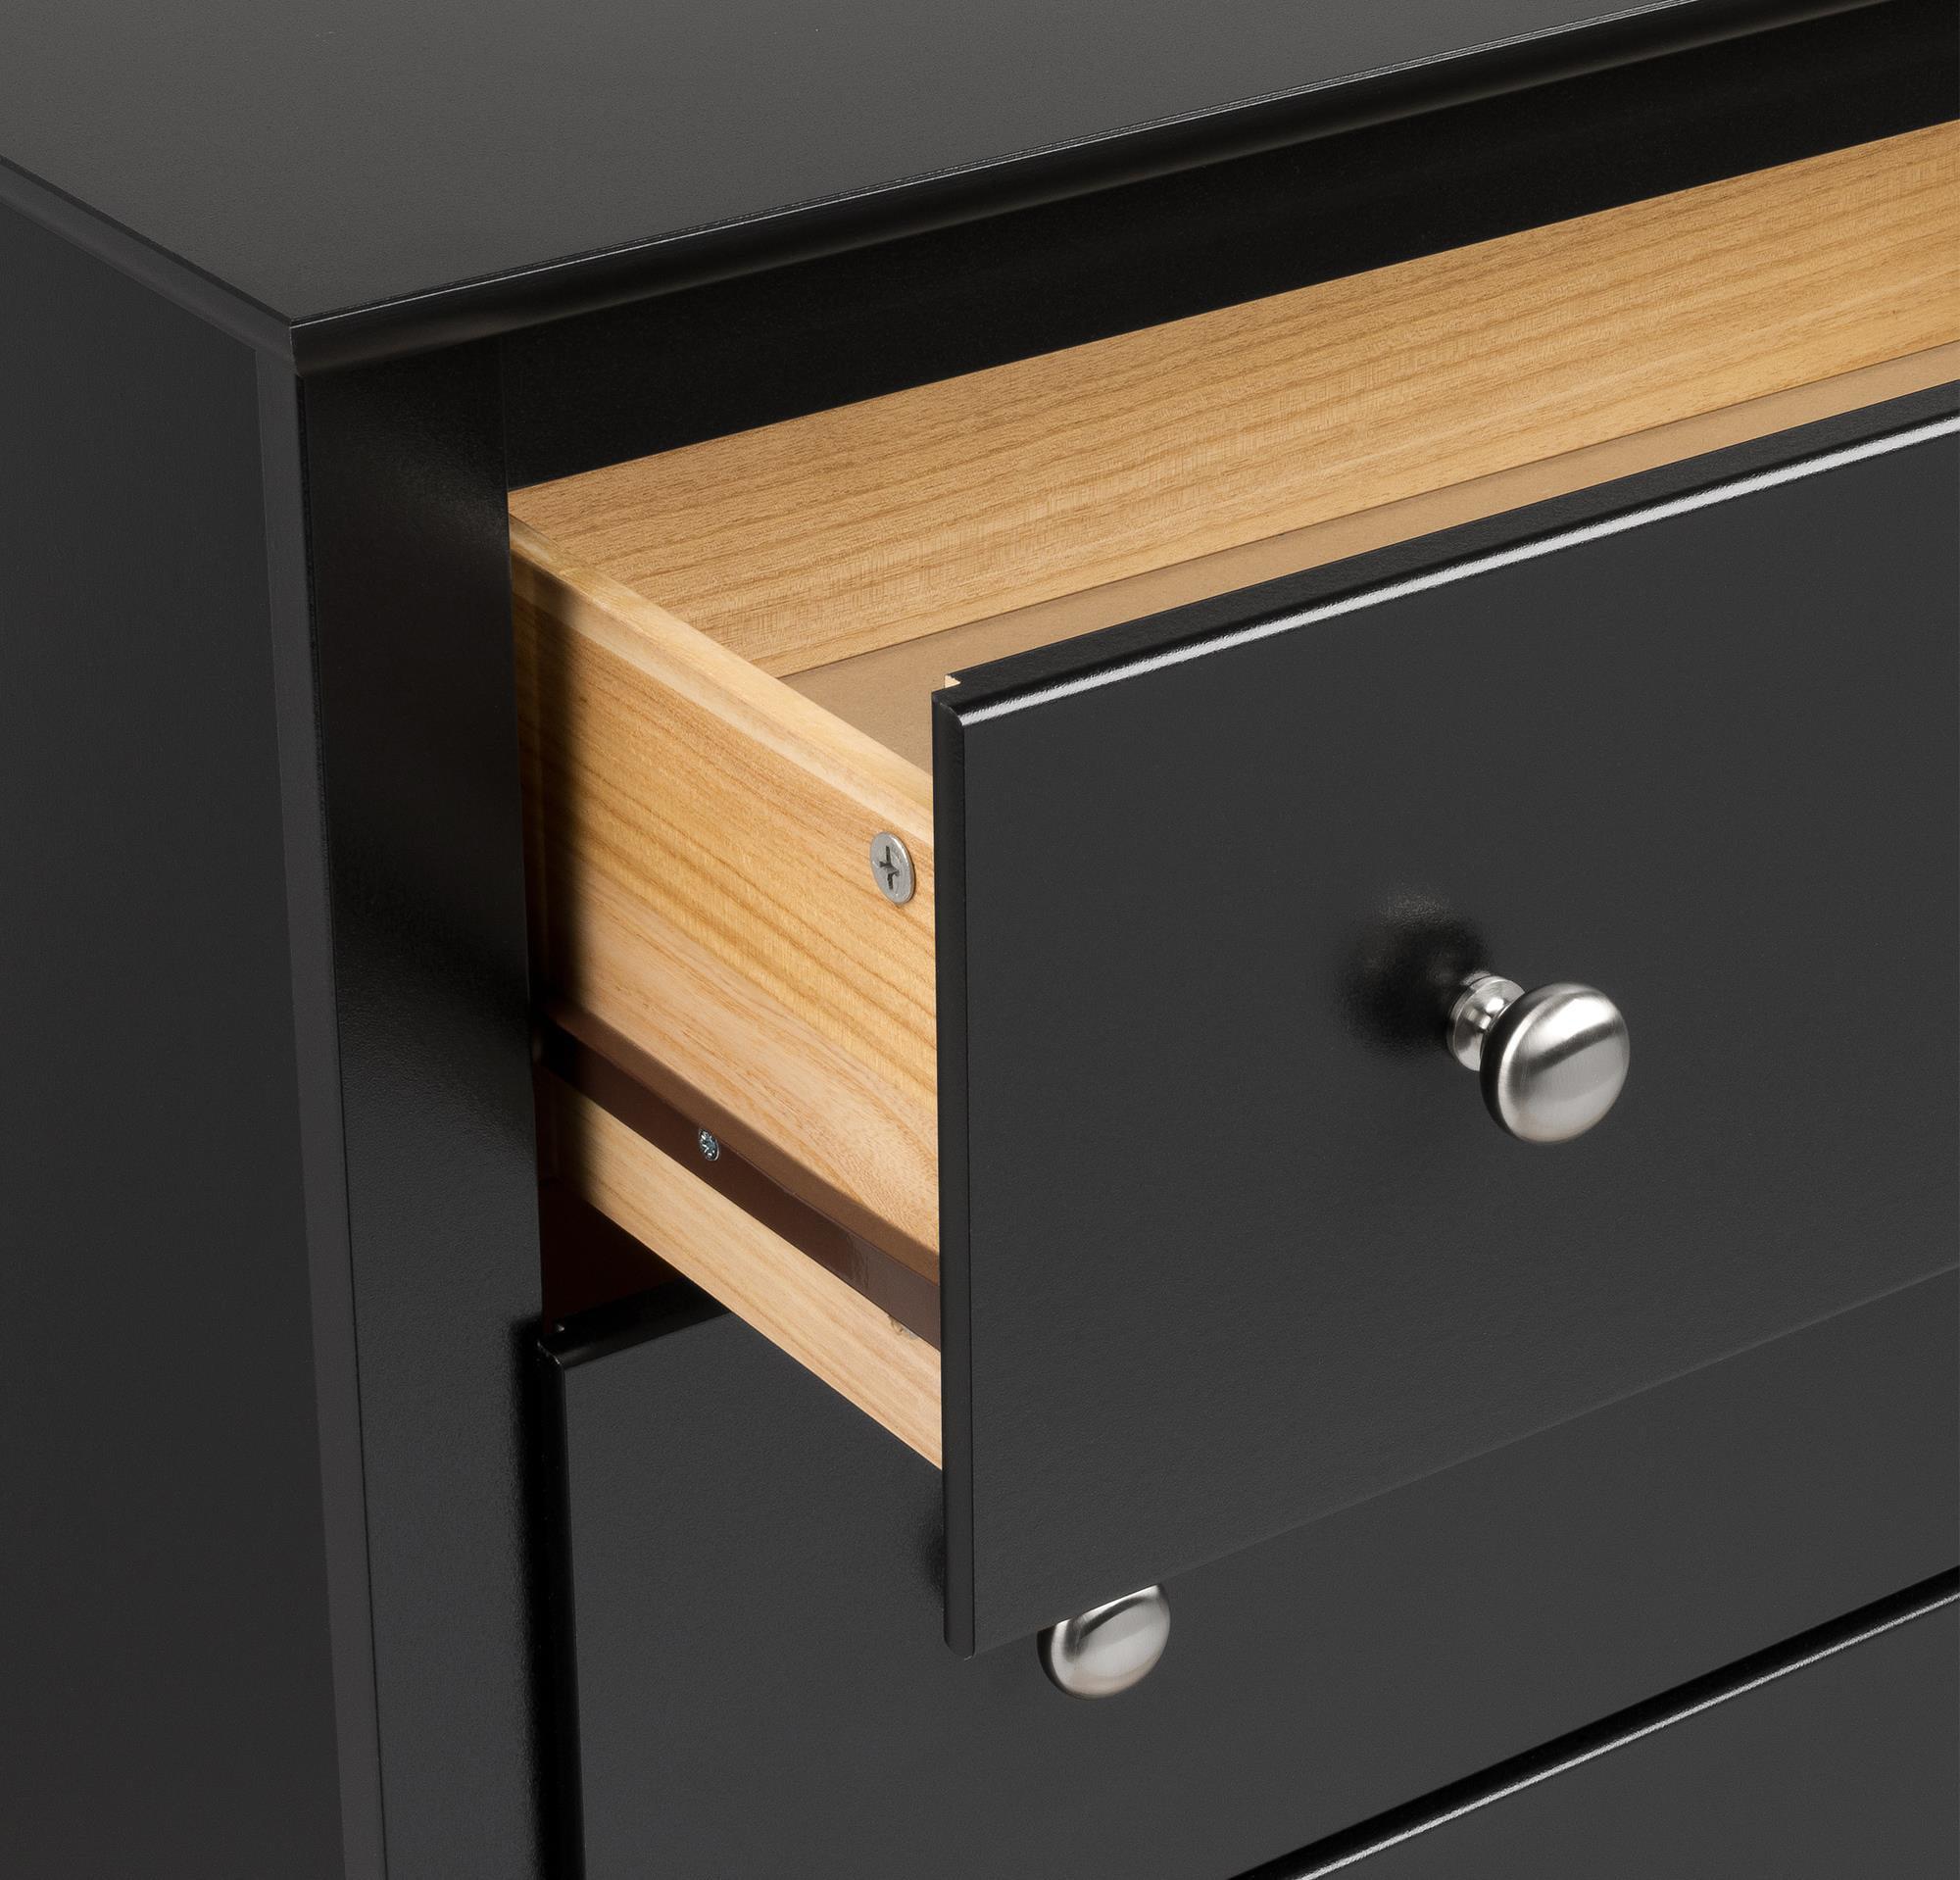 Sonoma Tall 6 Drawer Dresser, Black   Walmart.com